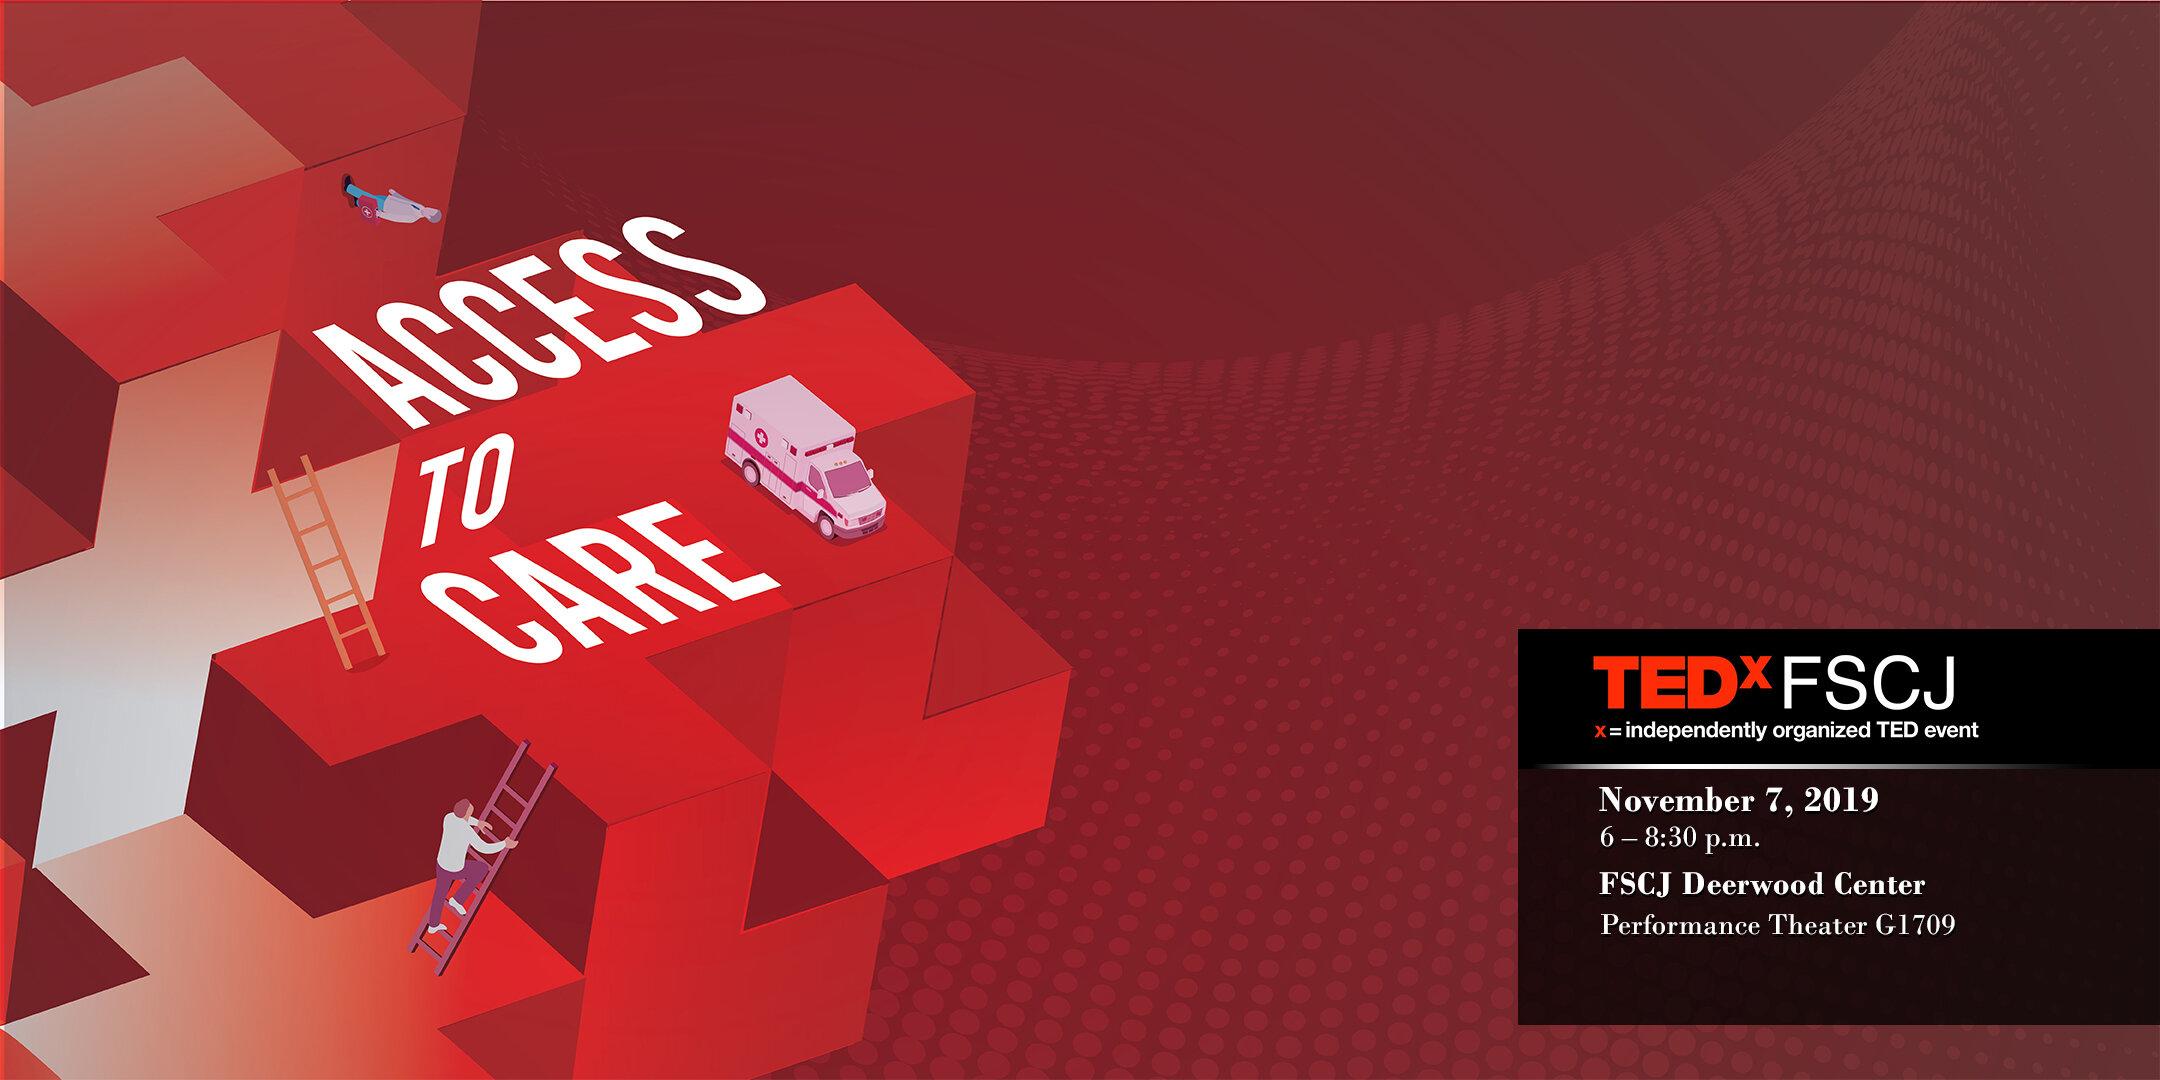 Tedx Salon- Access to Care EventBrite 2160x1080-01.jpg